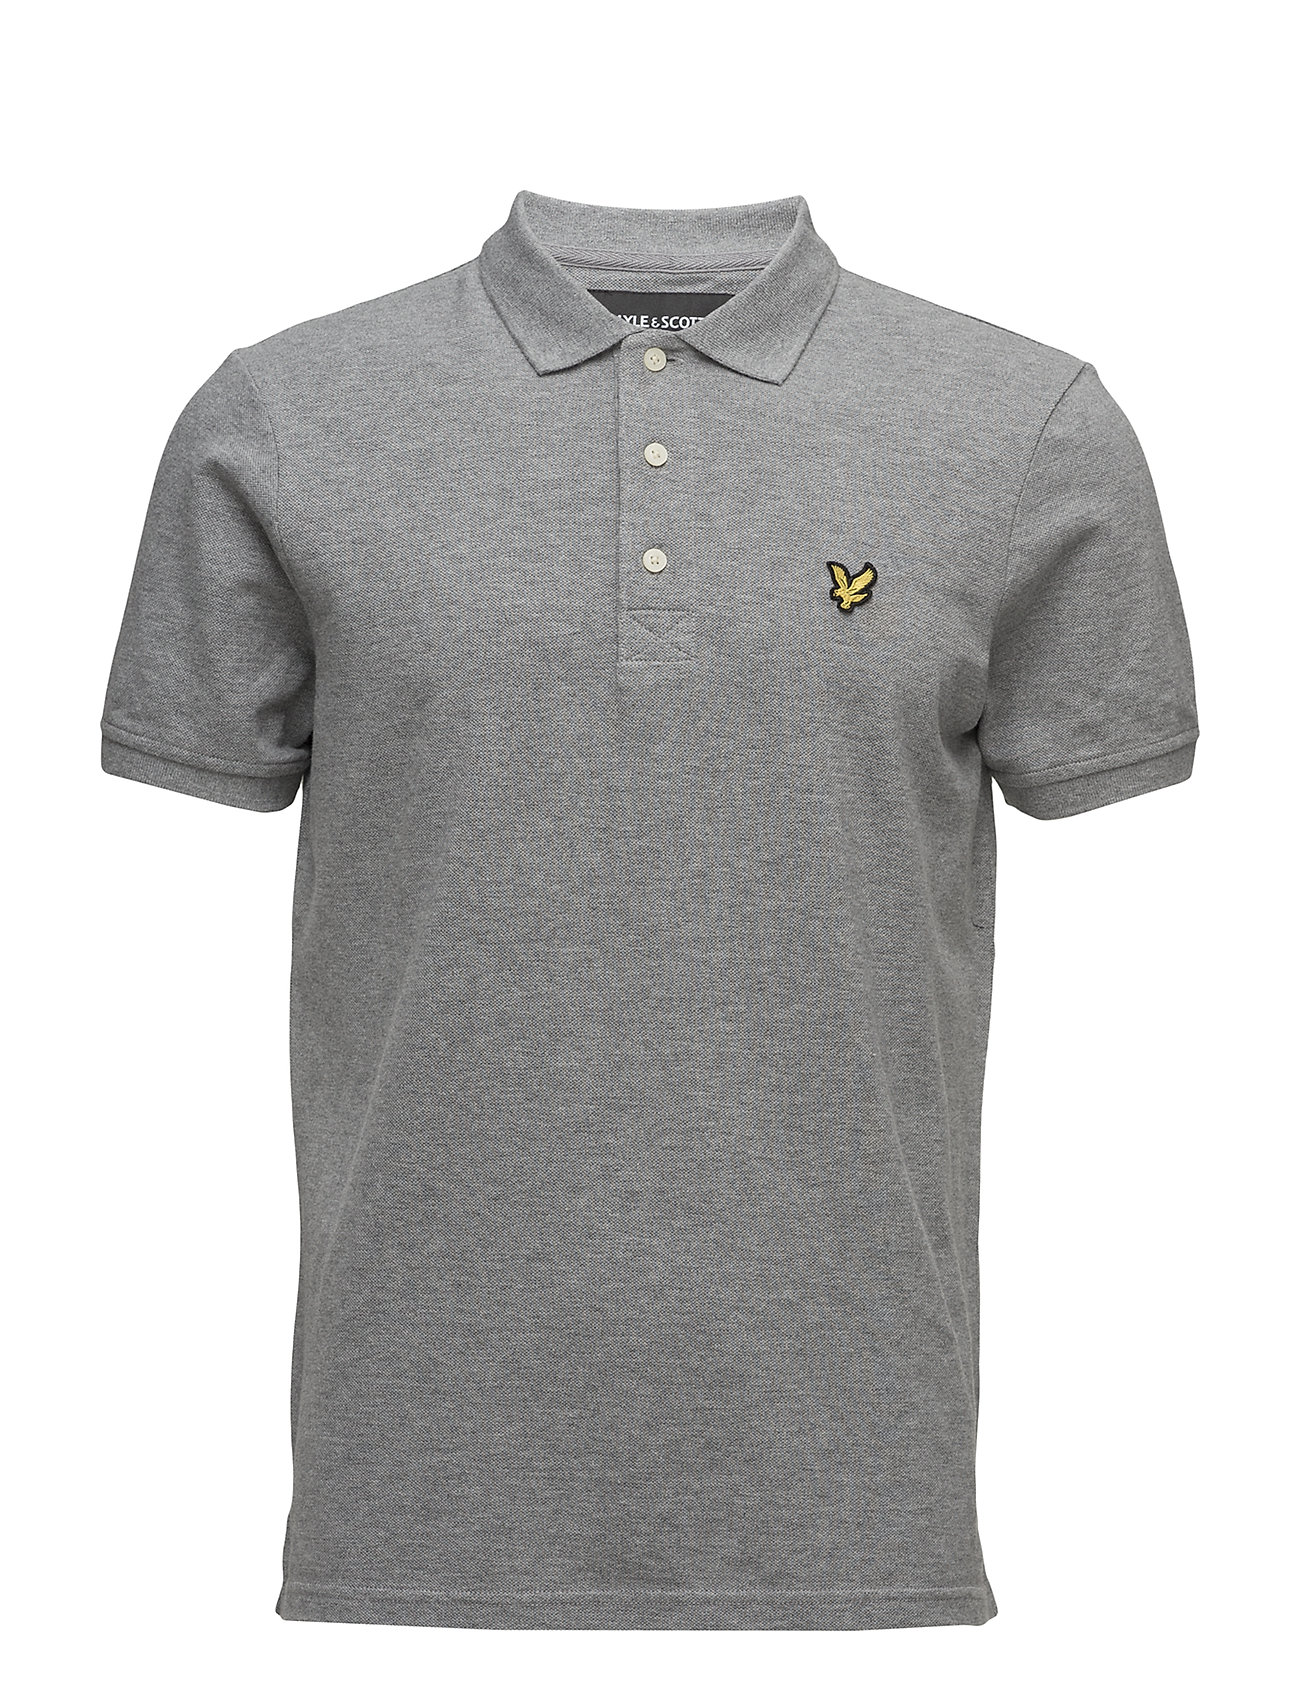 Lyle & Scott Polo Shirt - MID GREY MARL